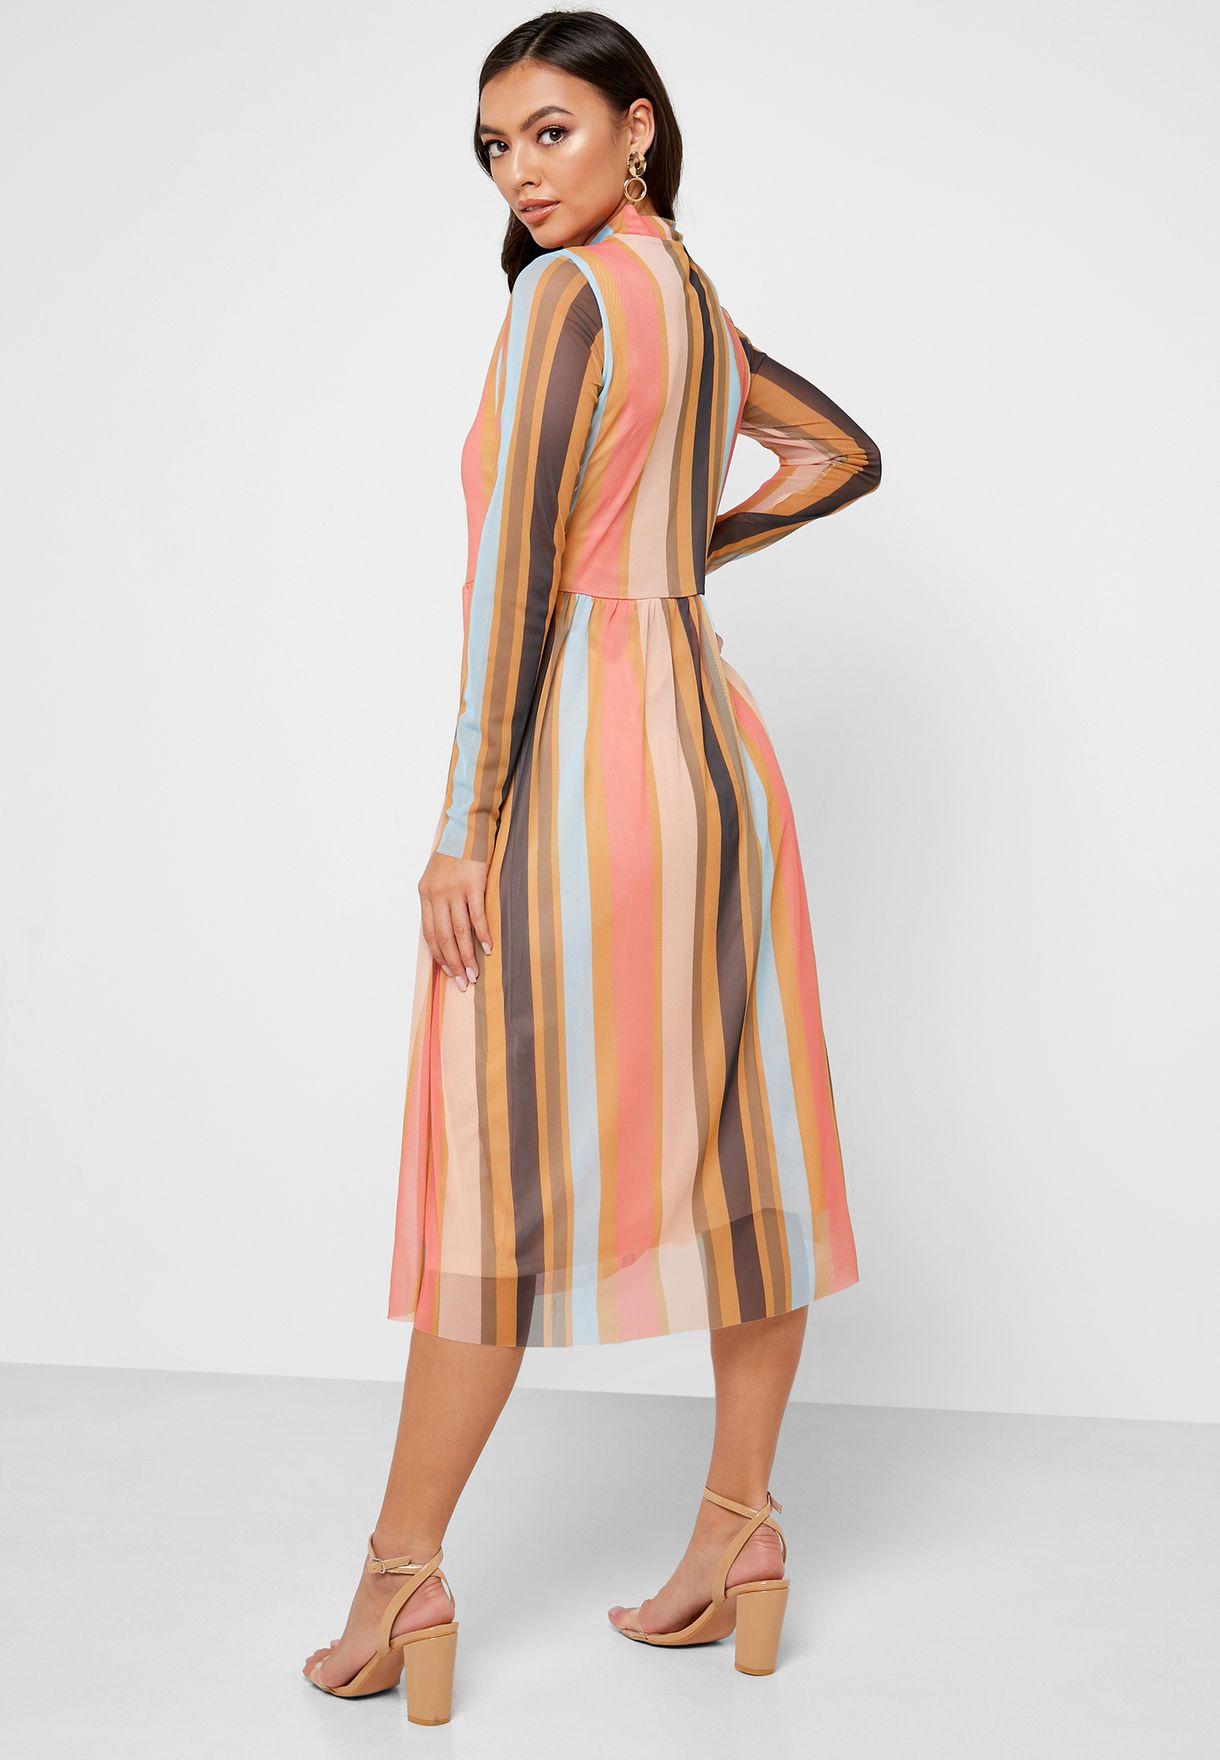 High Neck Striped Dress